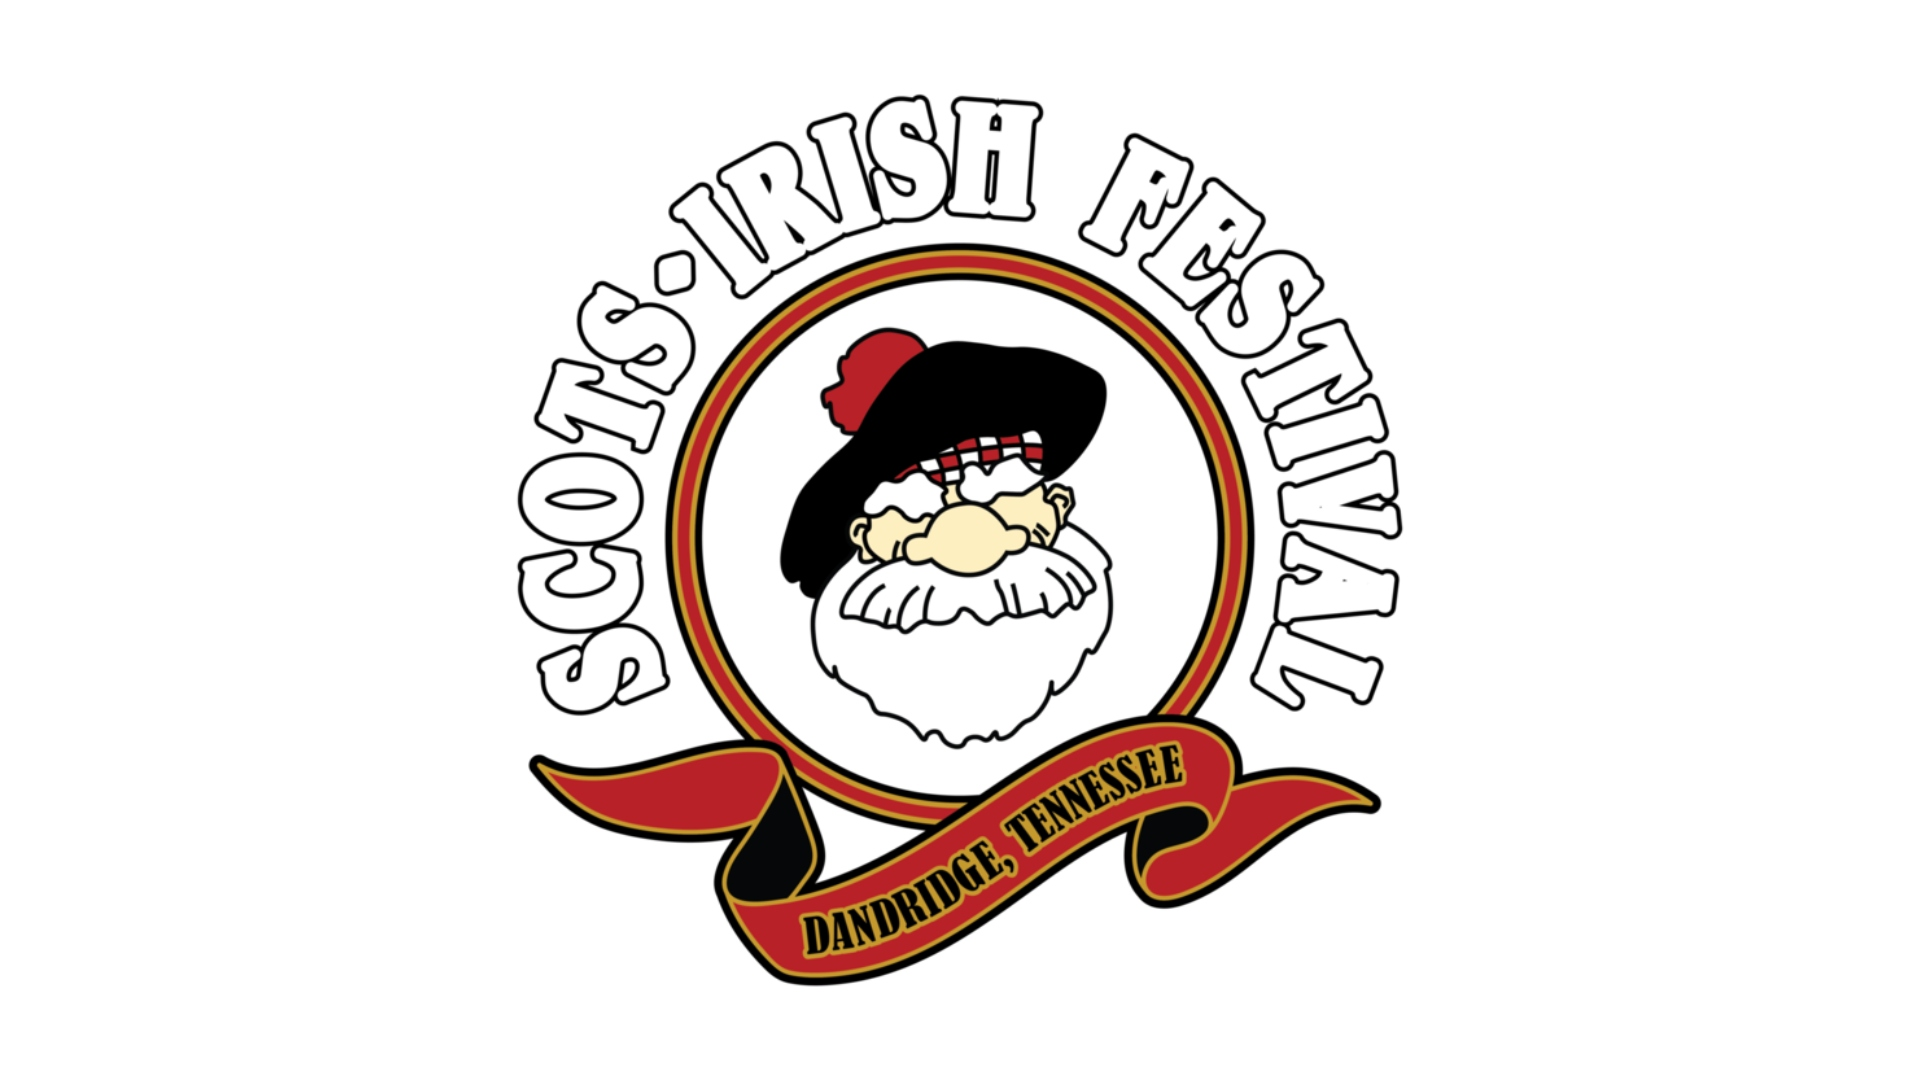 scots-irish festival logo